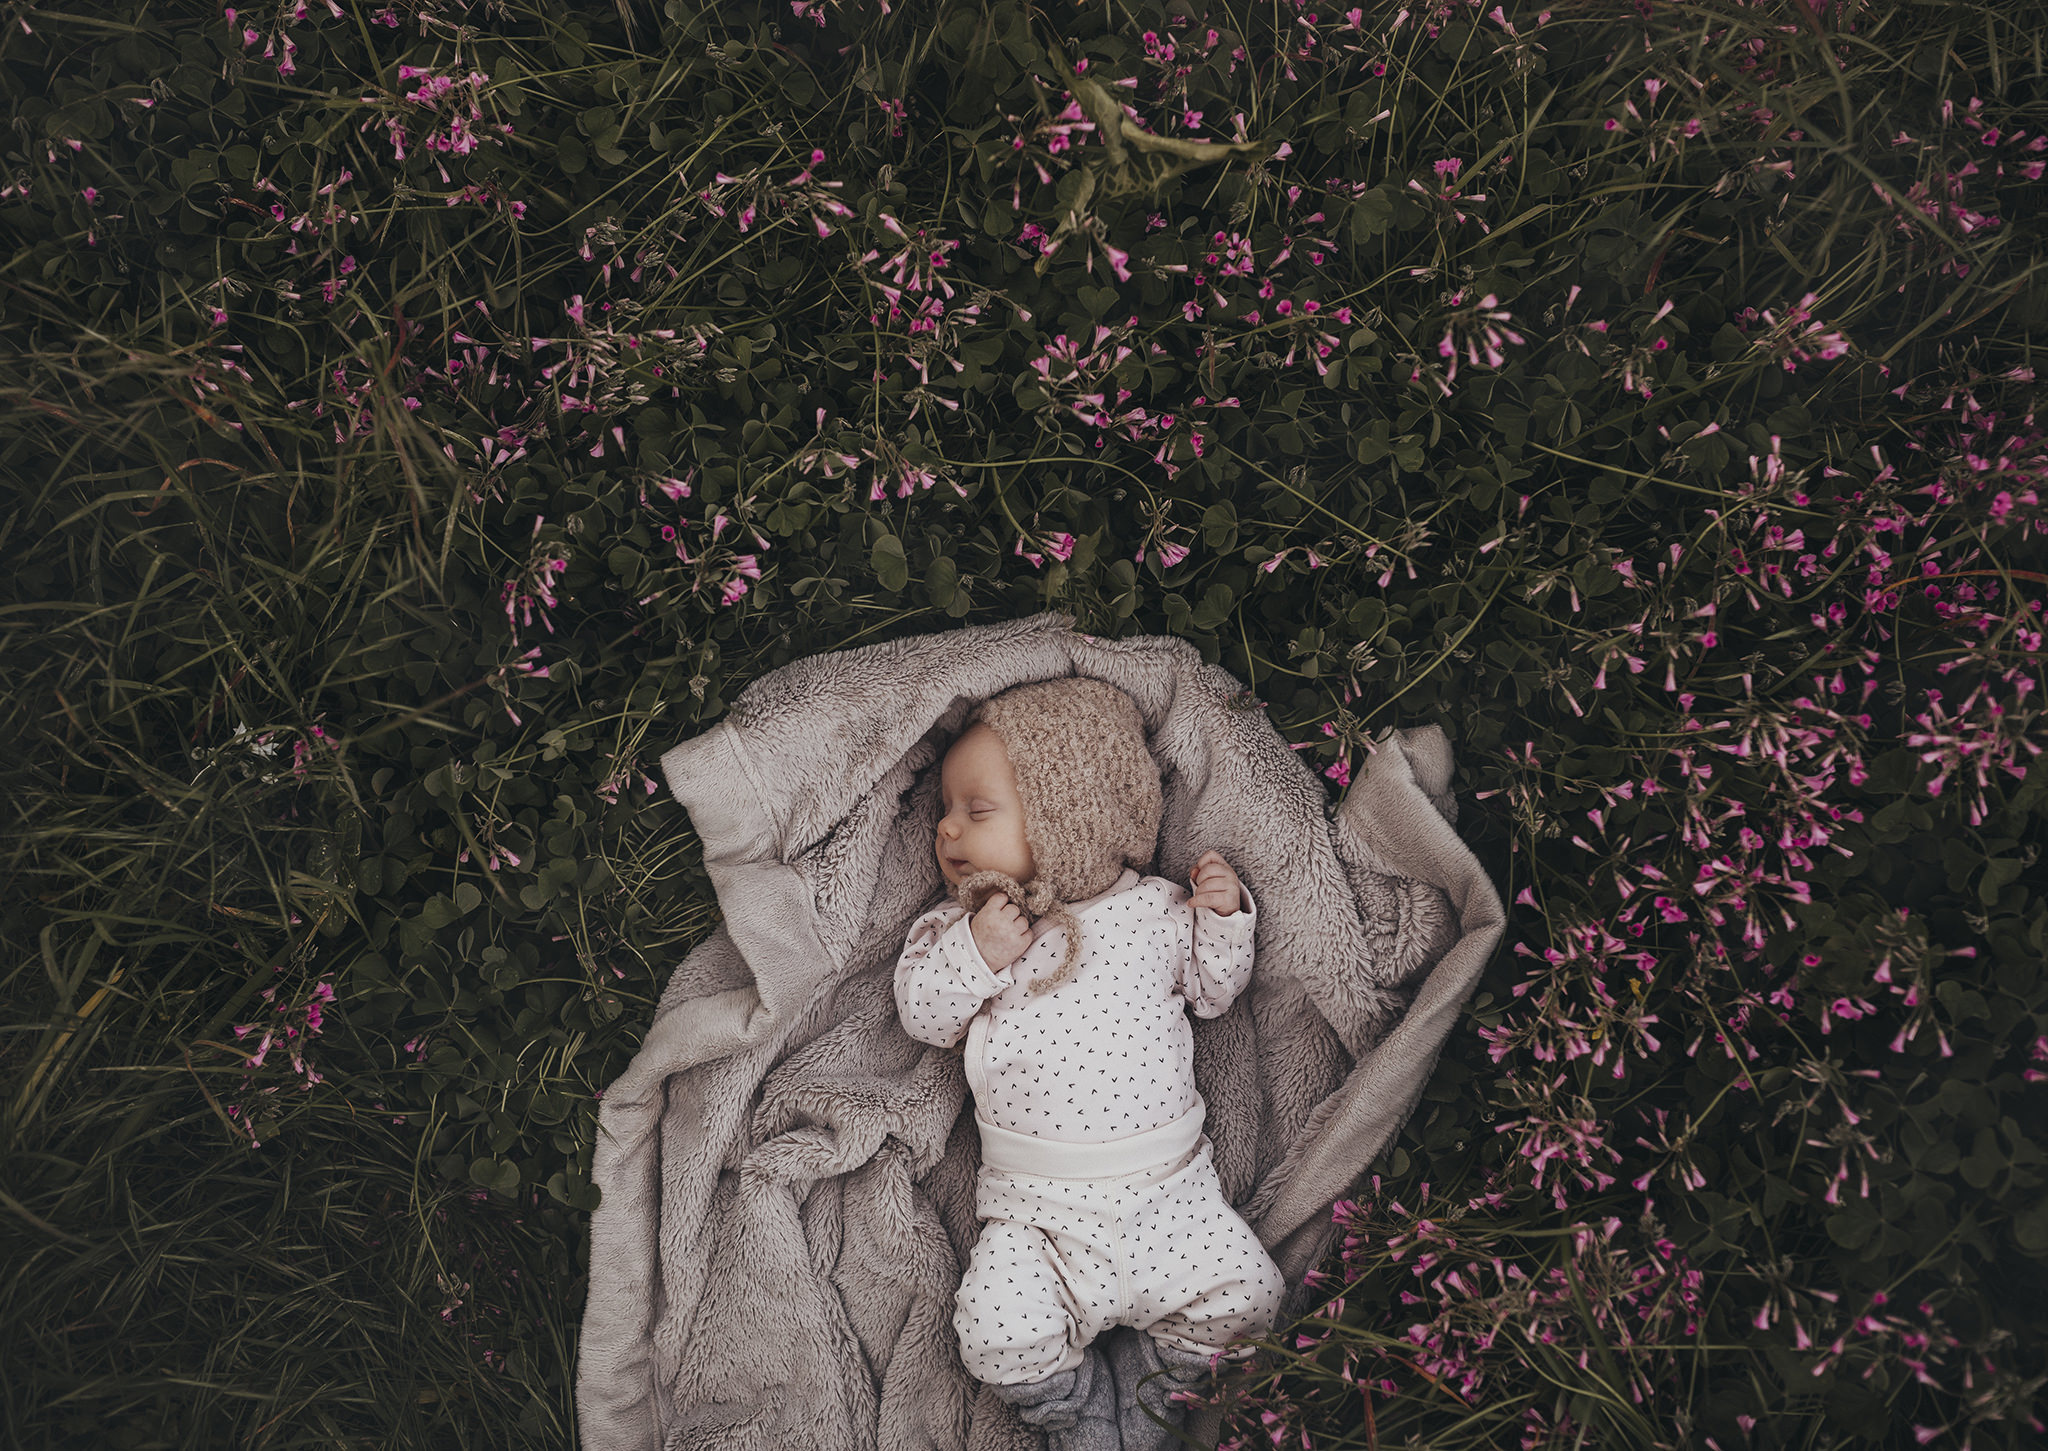 A Kid's Life VIII